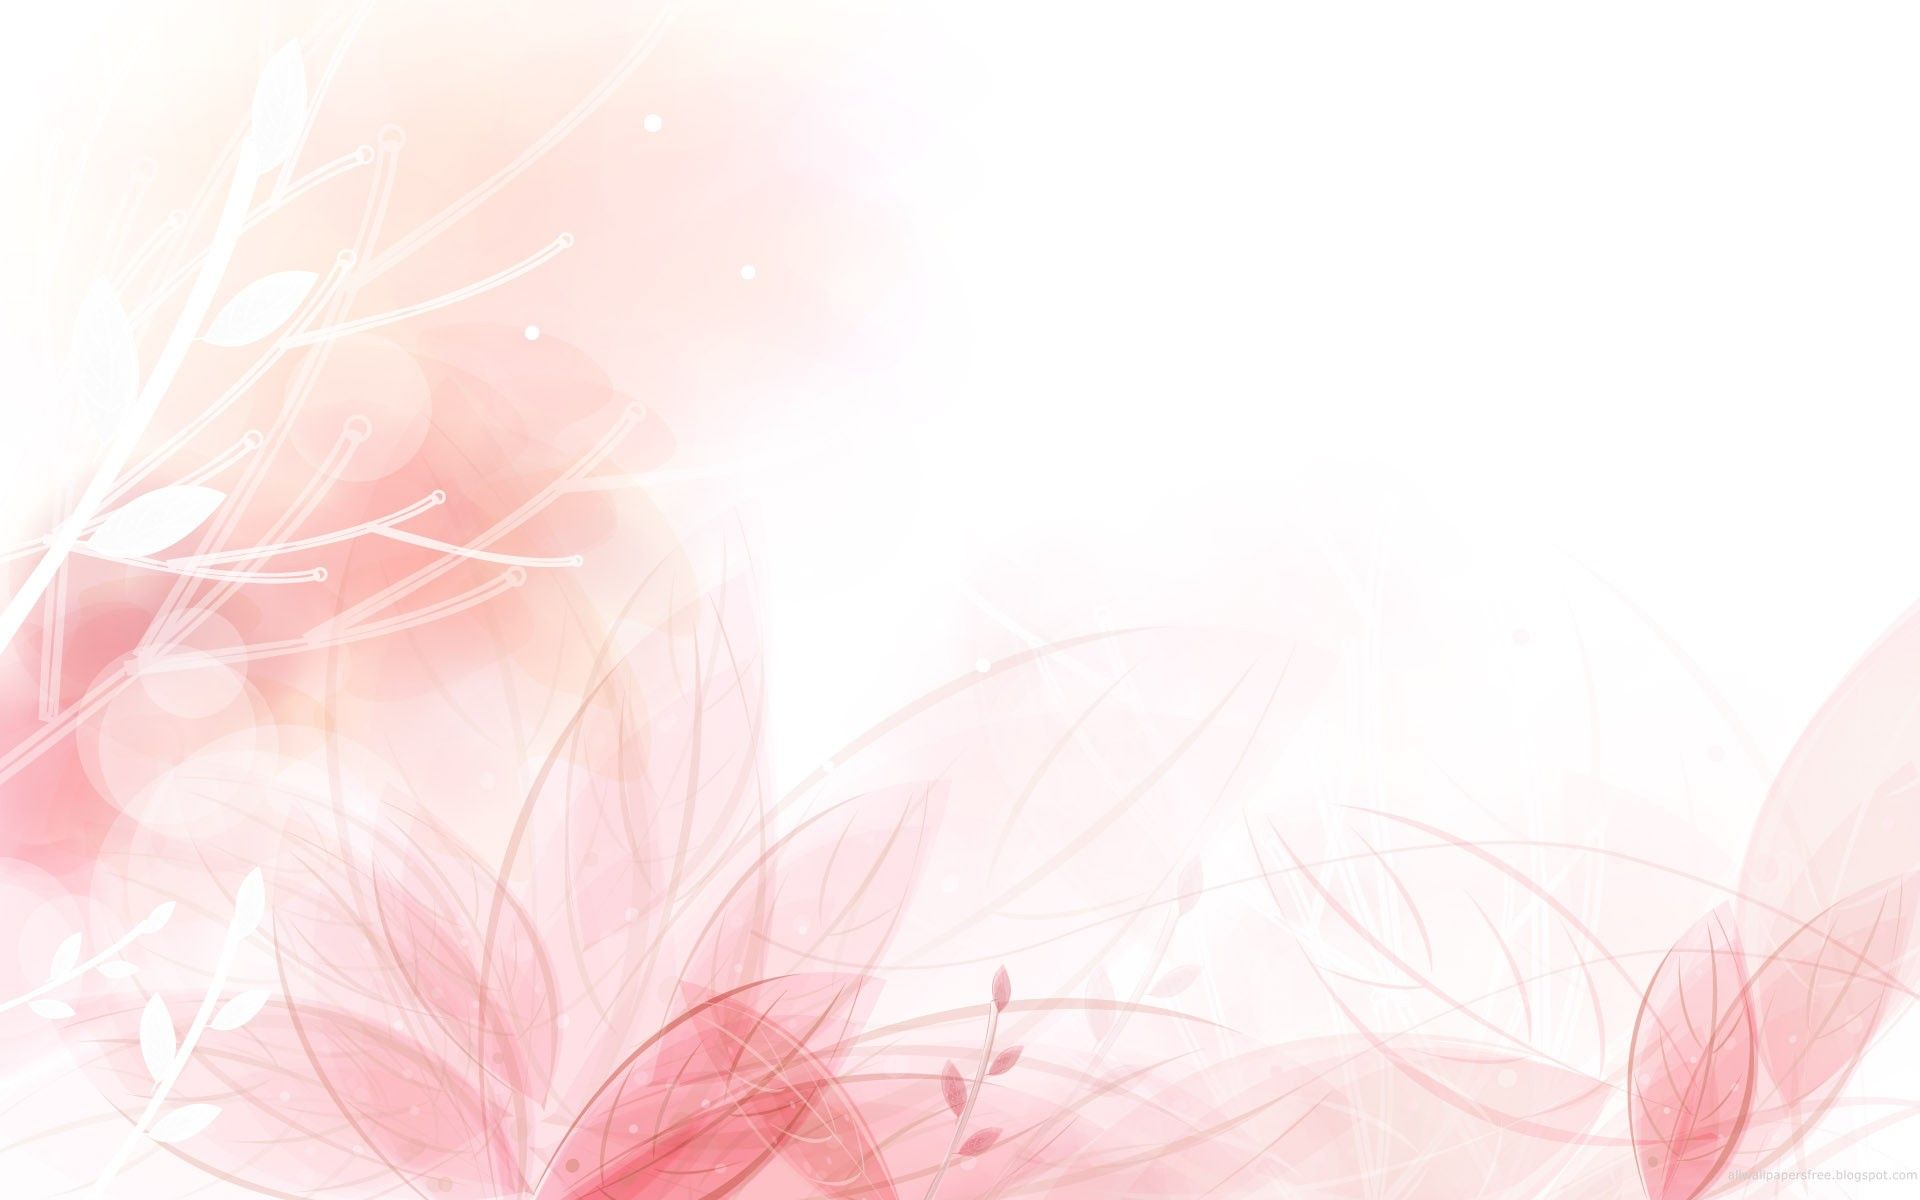 Light Pink Wallpapers   Full HD wallpaper search 1920x1200